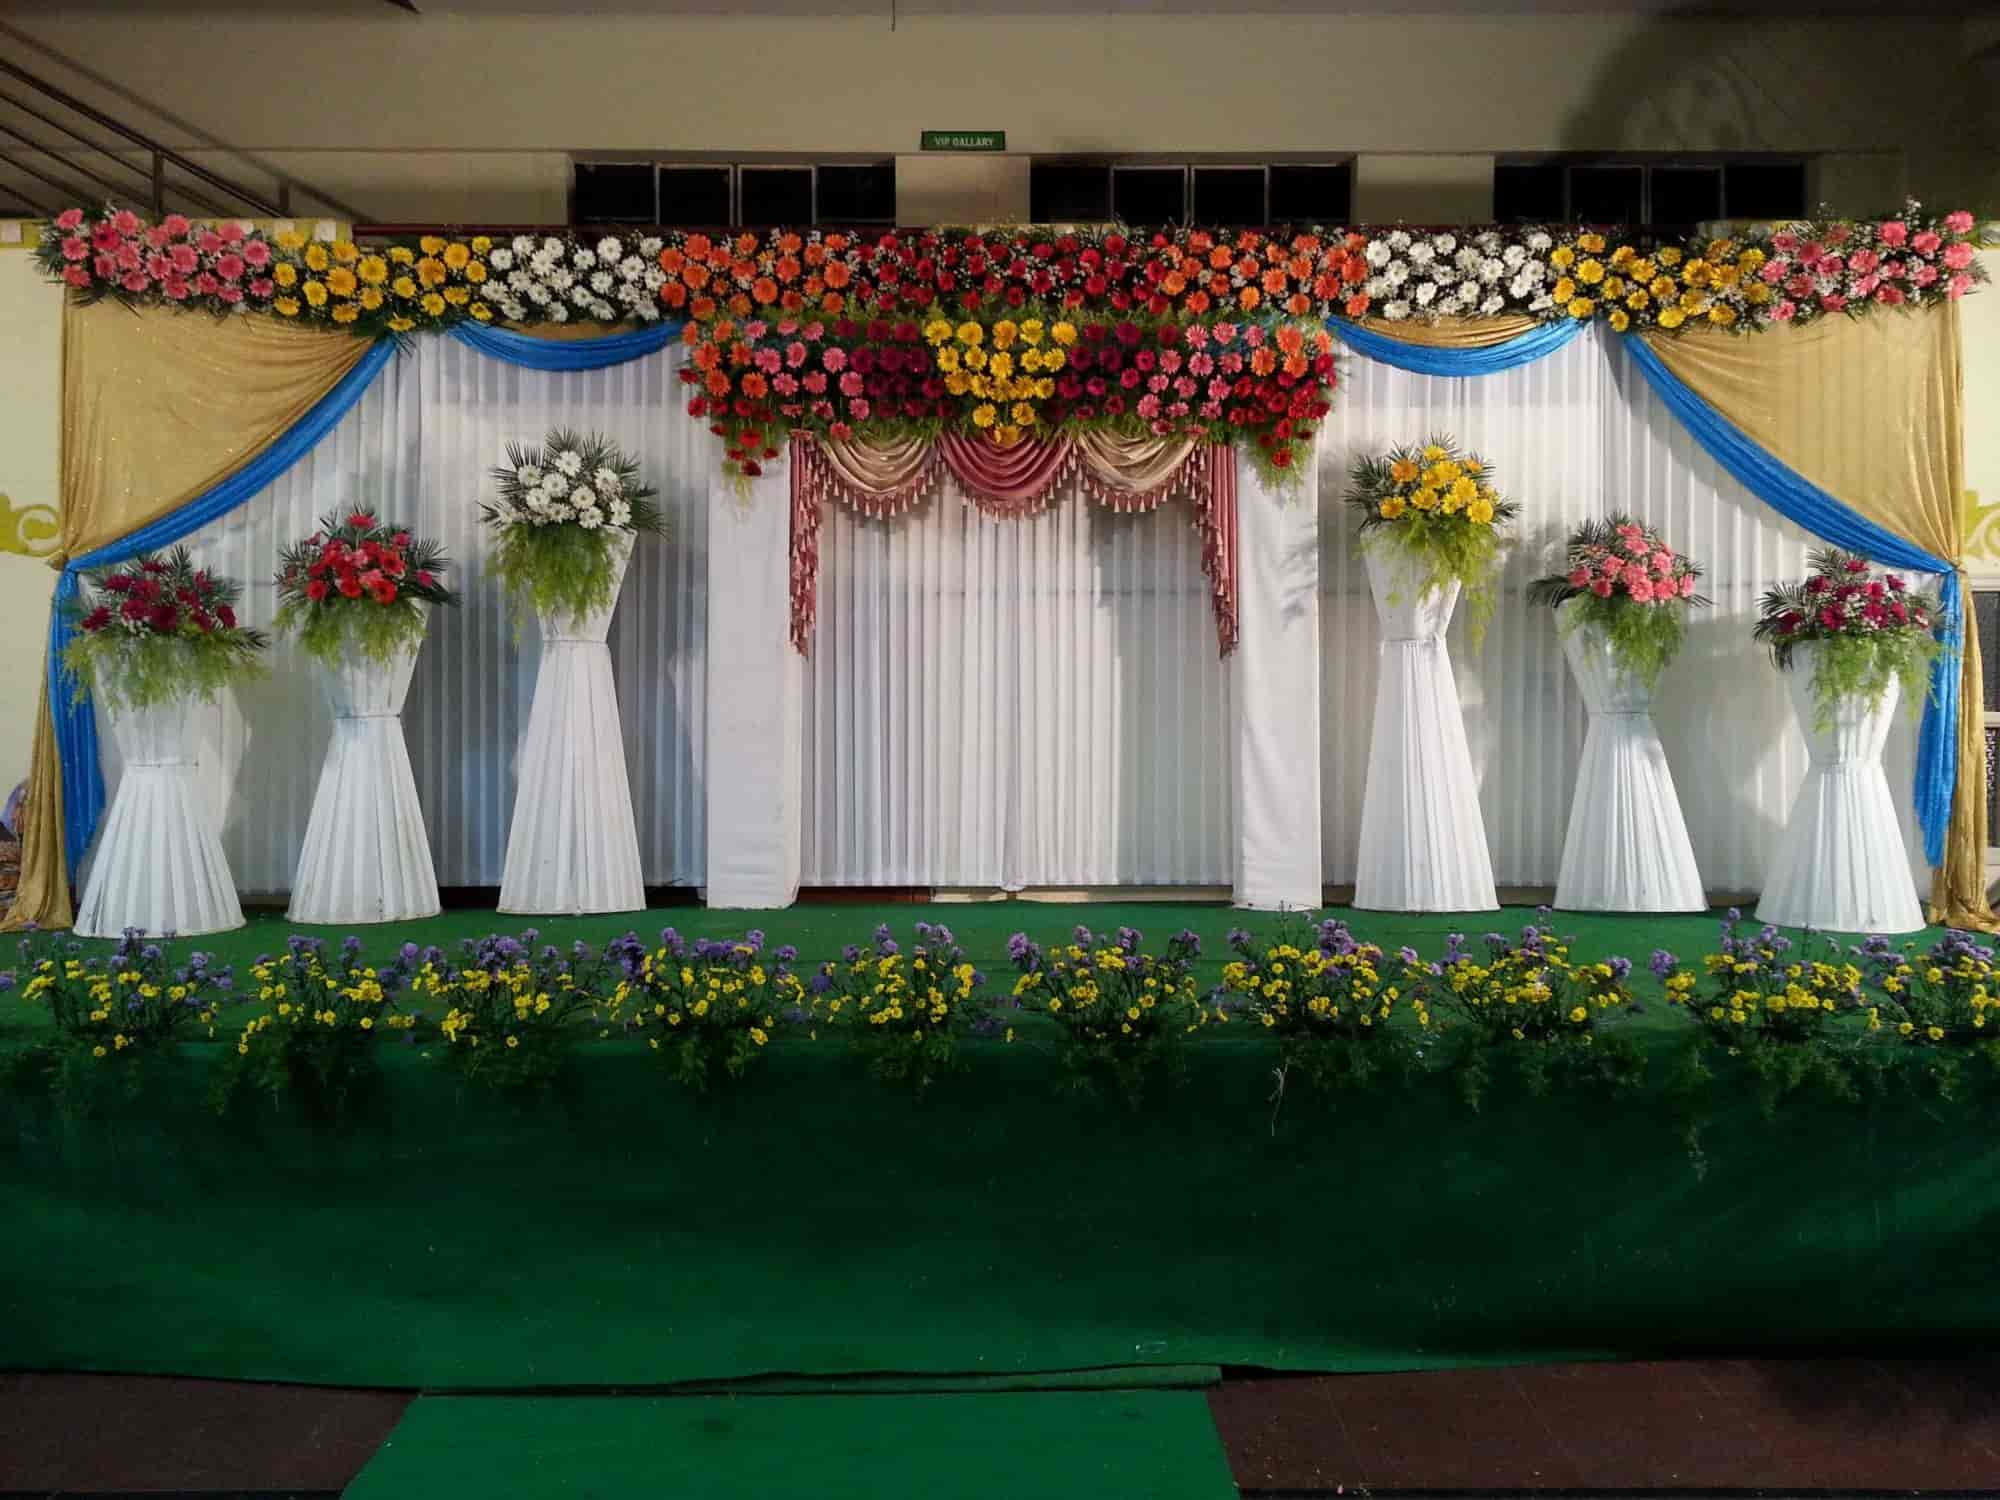 Sri Lakshmi Vinayaka Flower Decoration   Sri Lakshmi Vinayak Flower  Decoration   Decorators In Madanapalle   Justdial